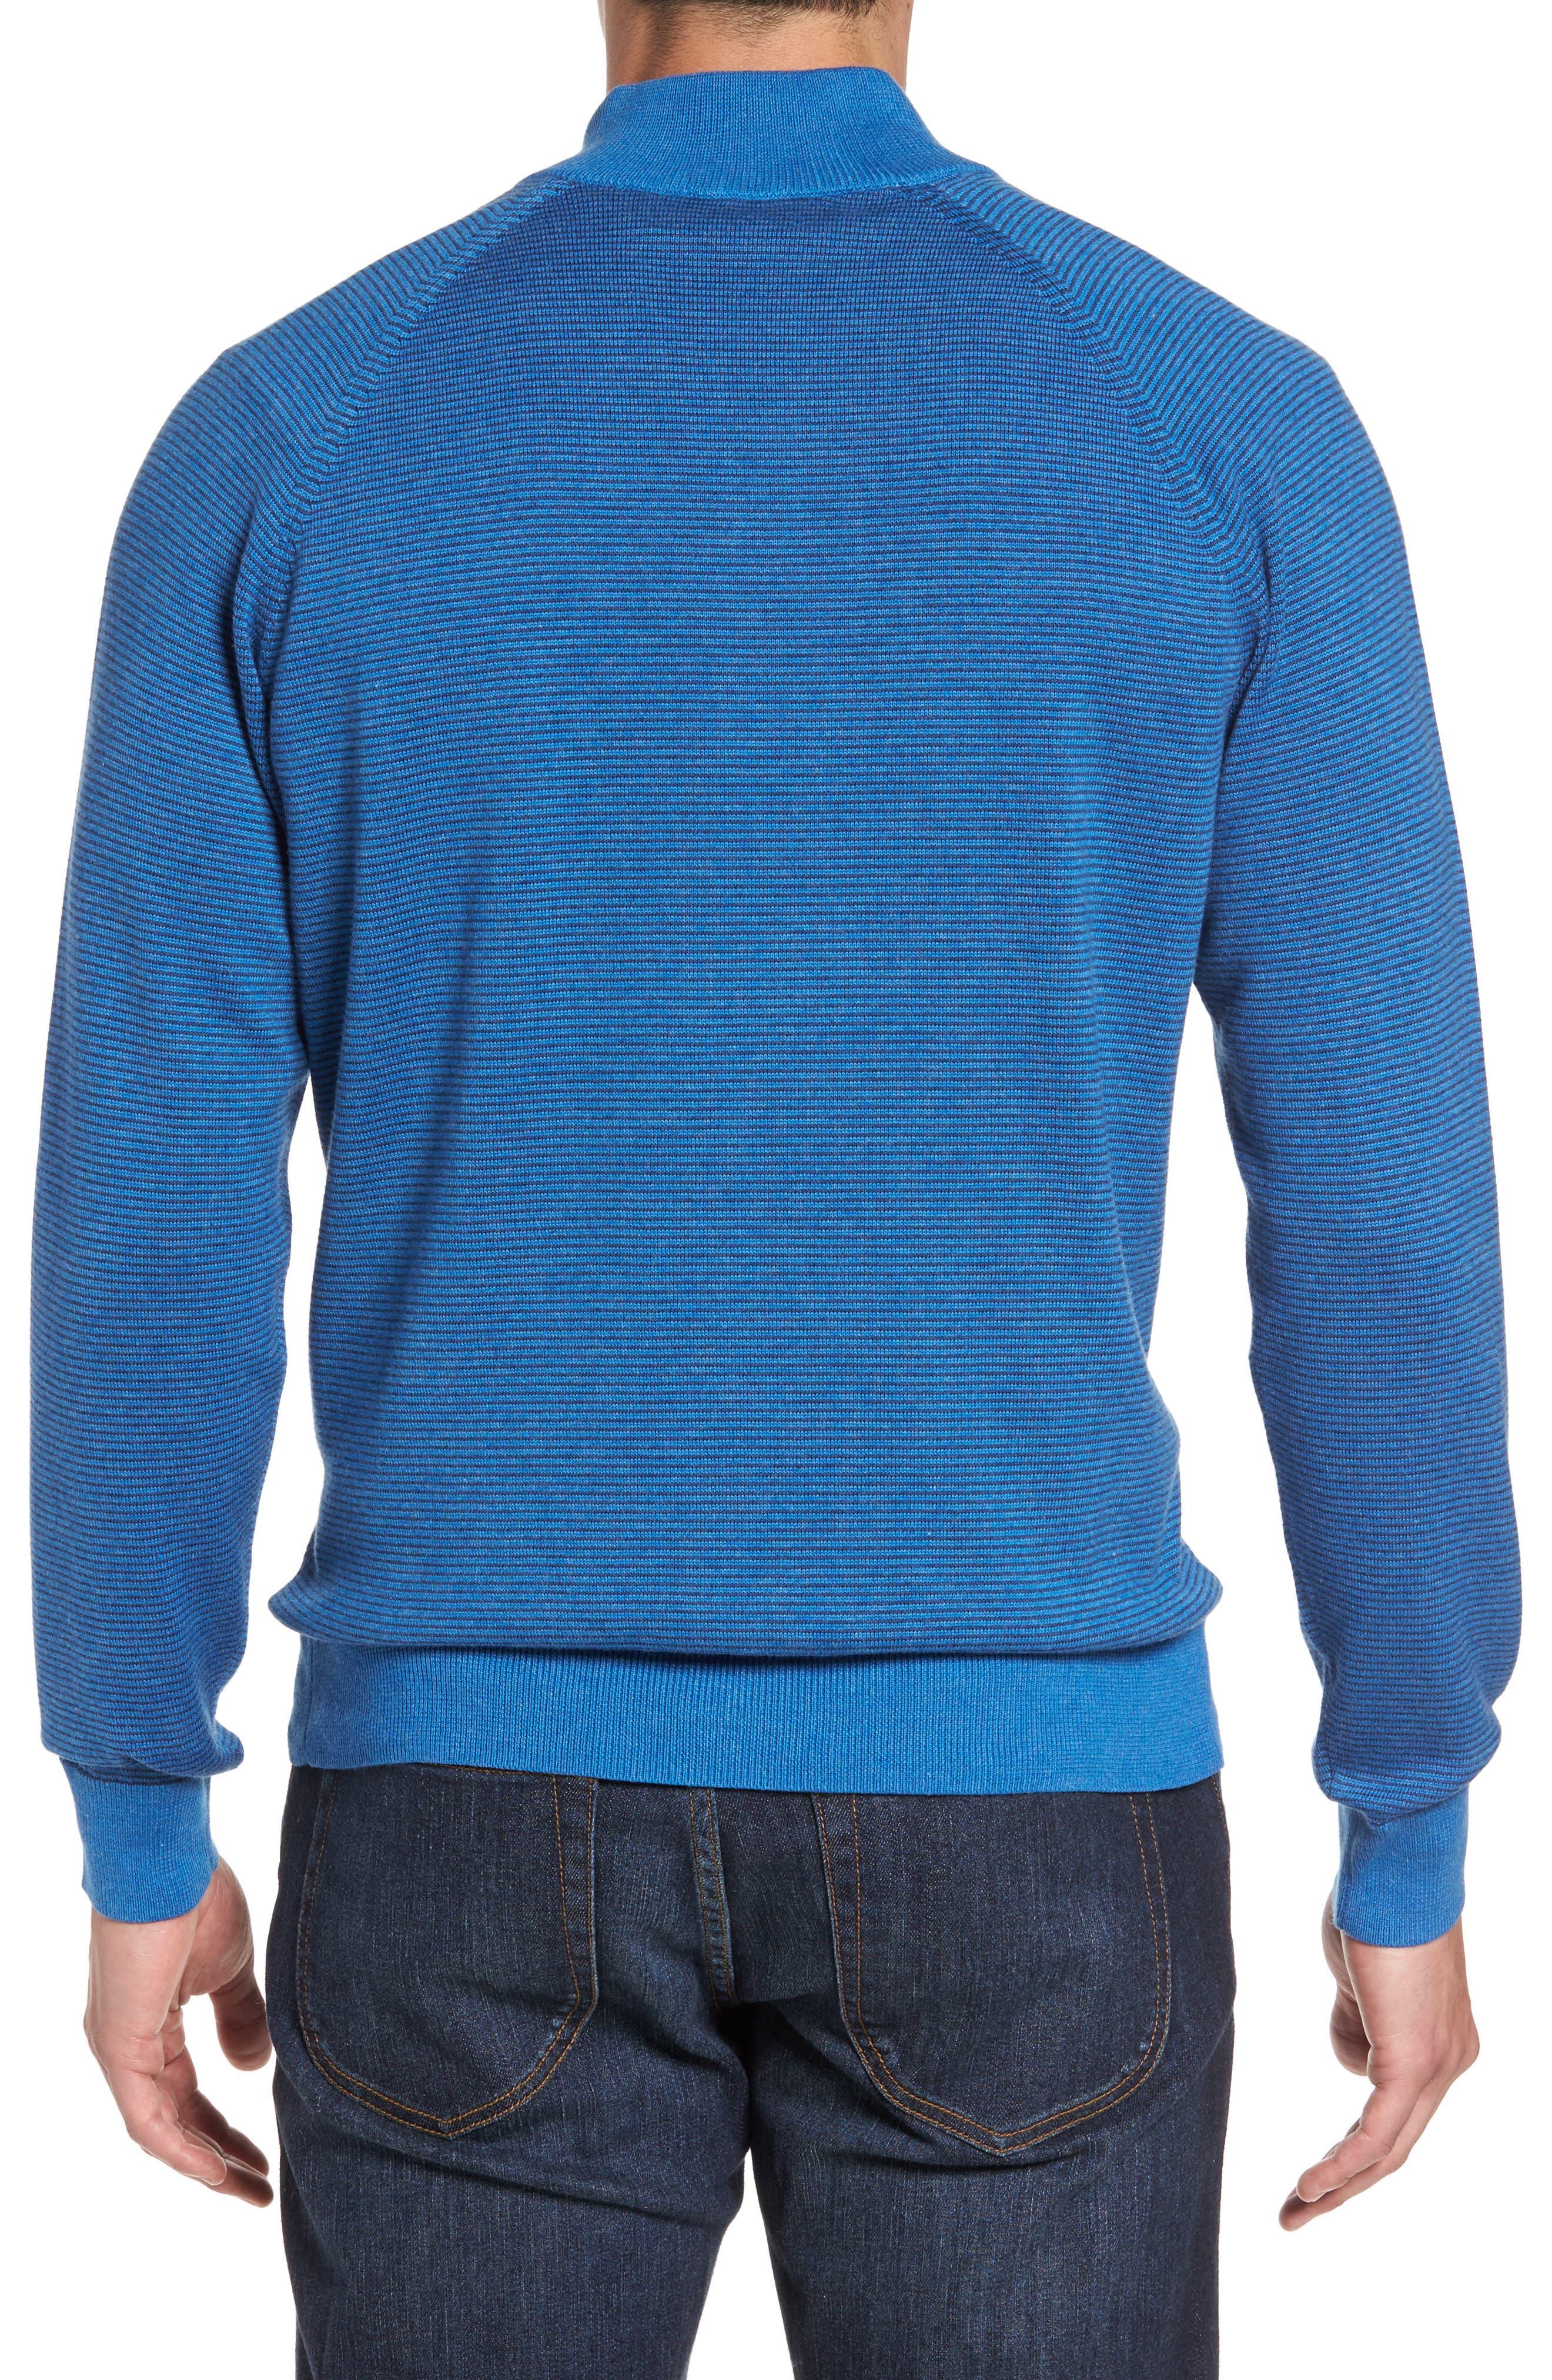 Fine Stripe Quarter Zip Sweater,                             Alternate thumbnail 2, color,                             Regatta Blue